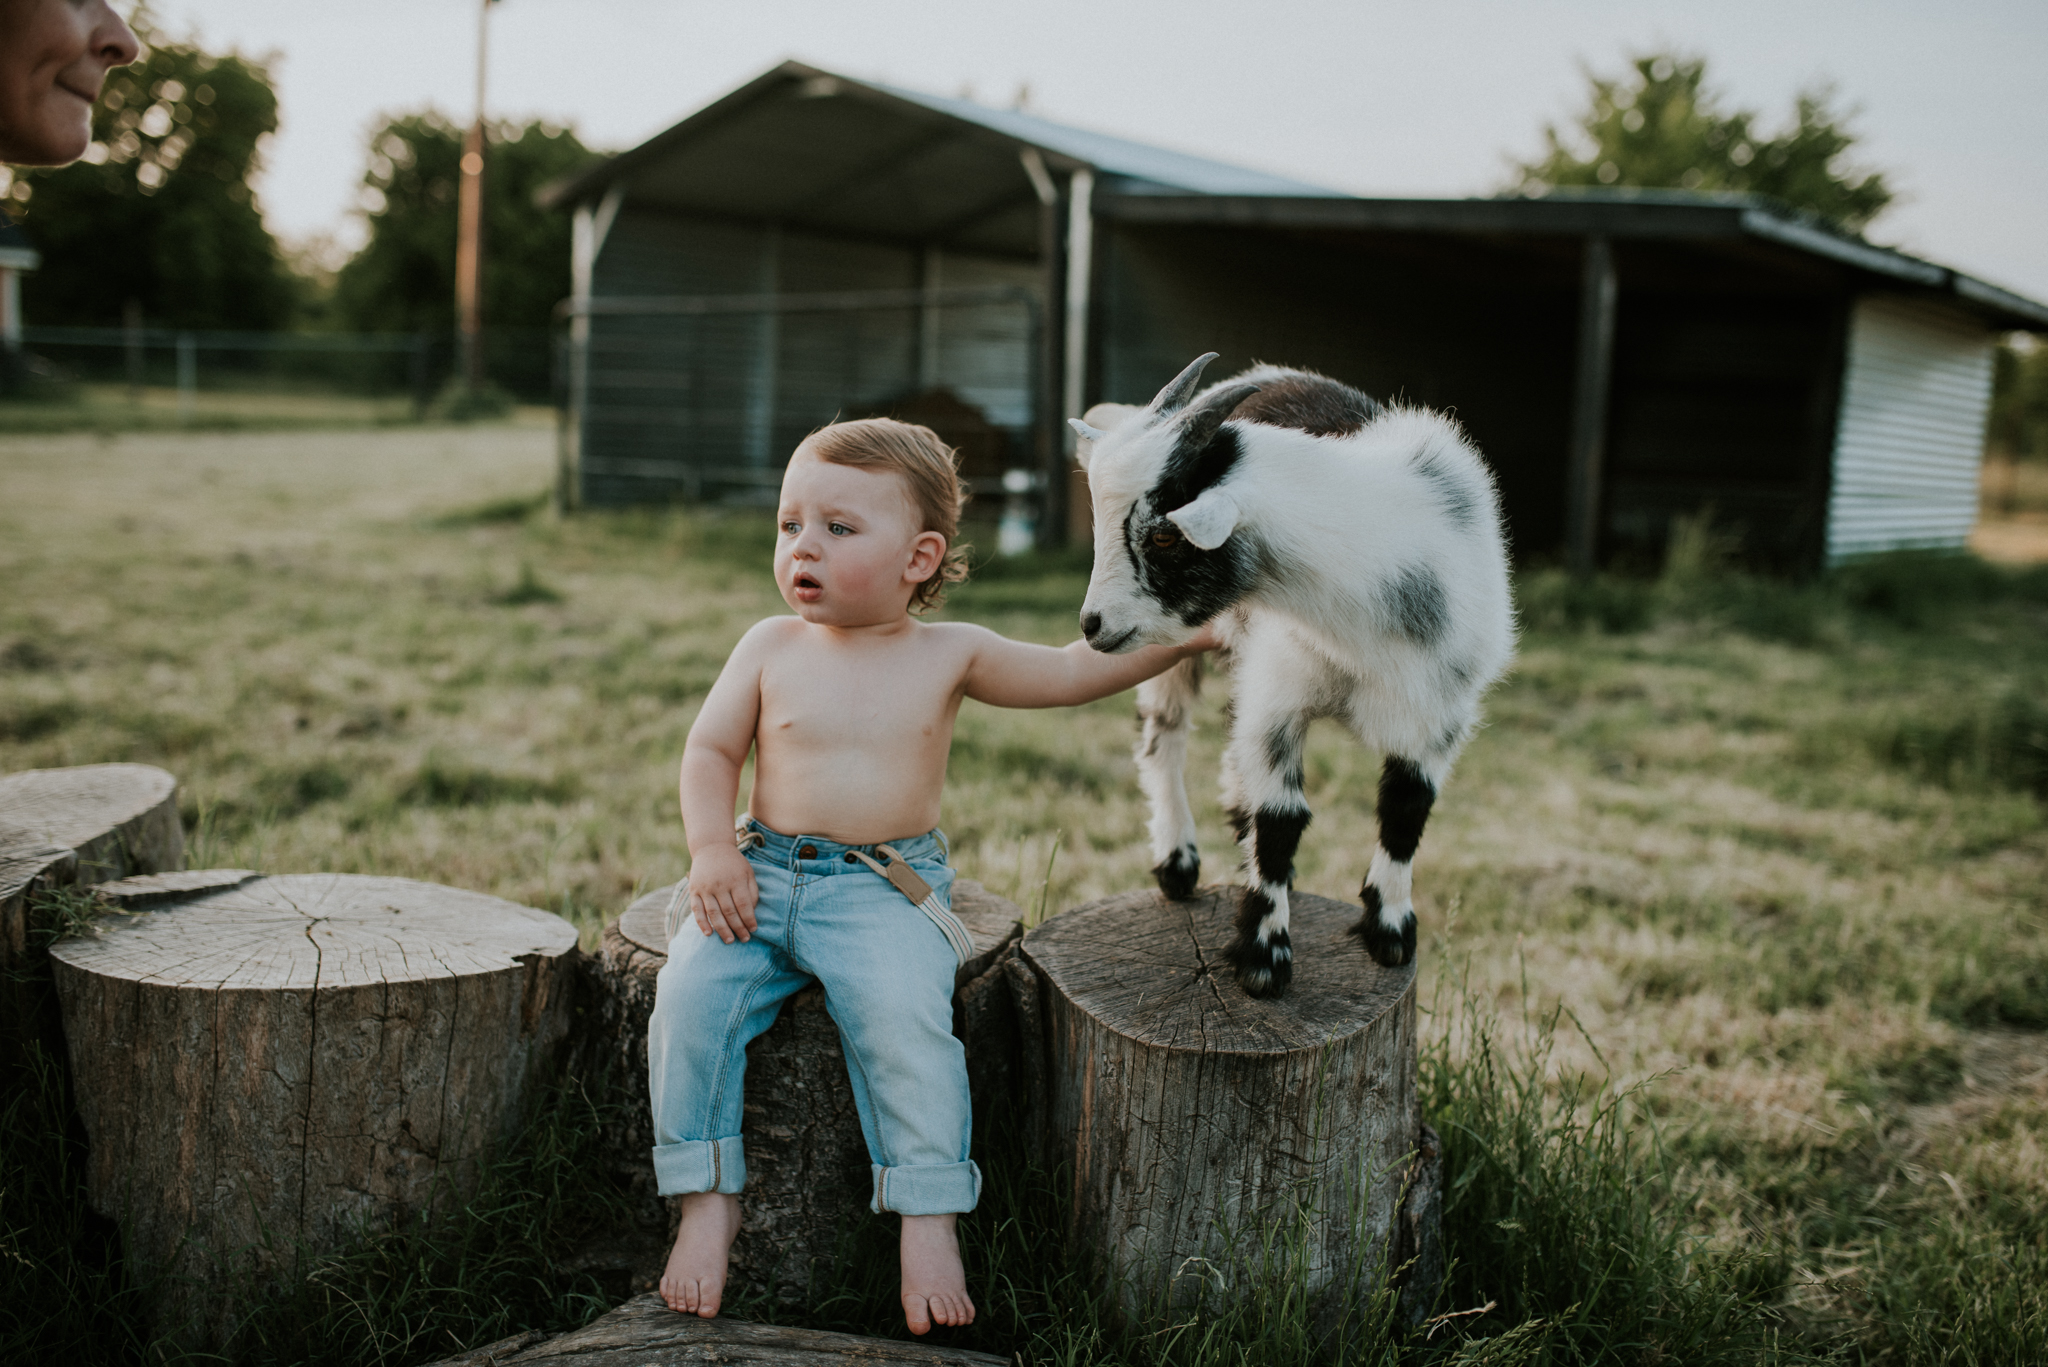 Graham-18 months-48.jpg